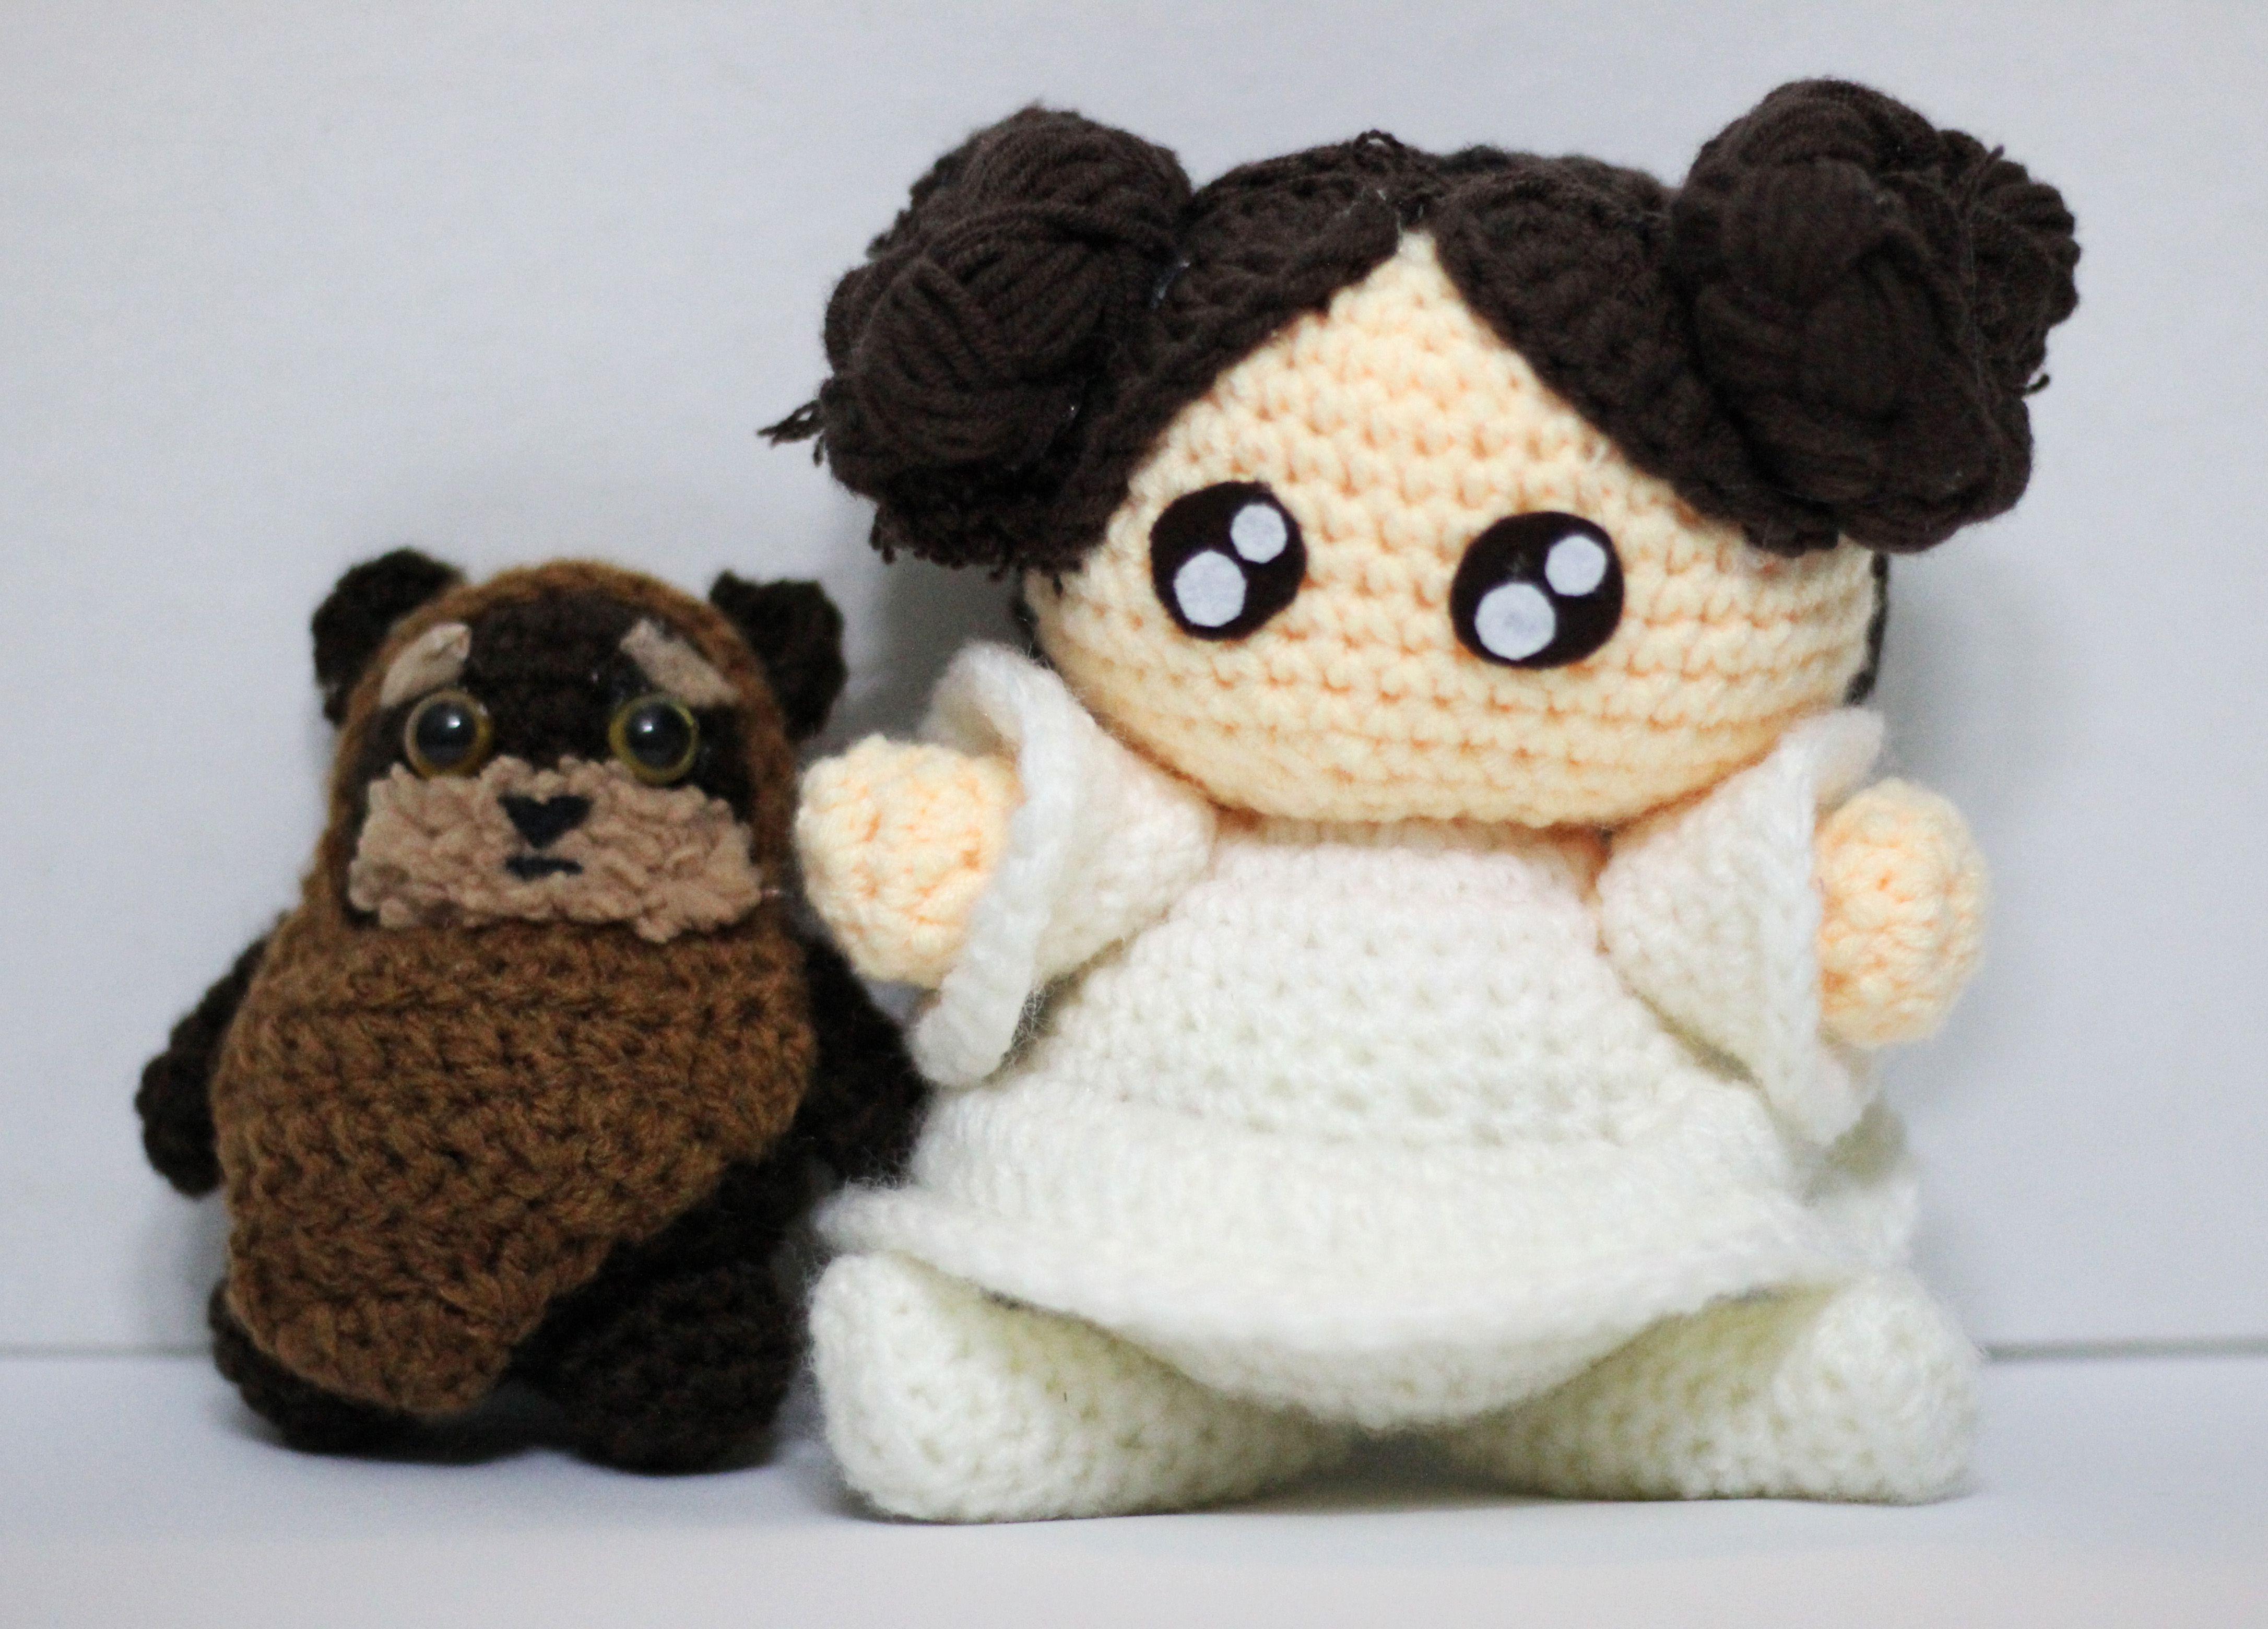 star doll wars ewok leia cute princess knit handmade toys yarn plushie nhimconshop plush